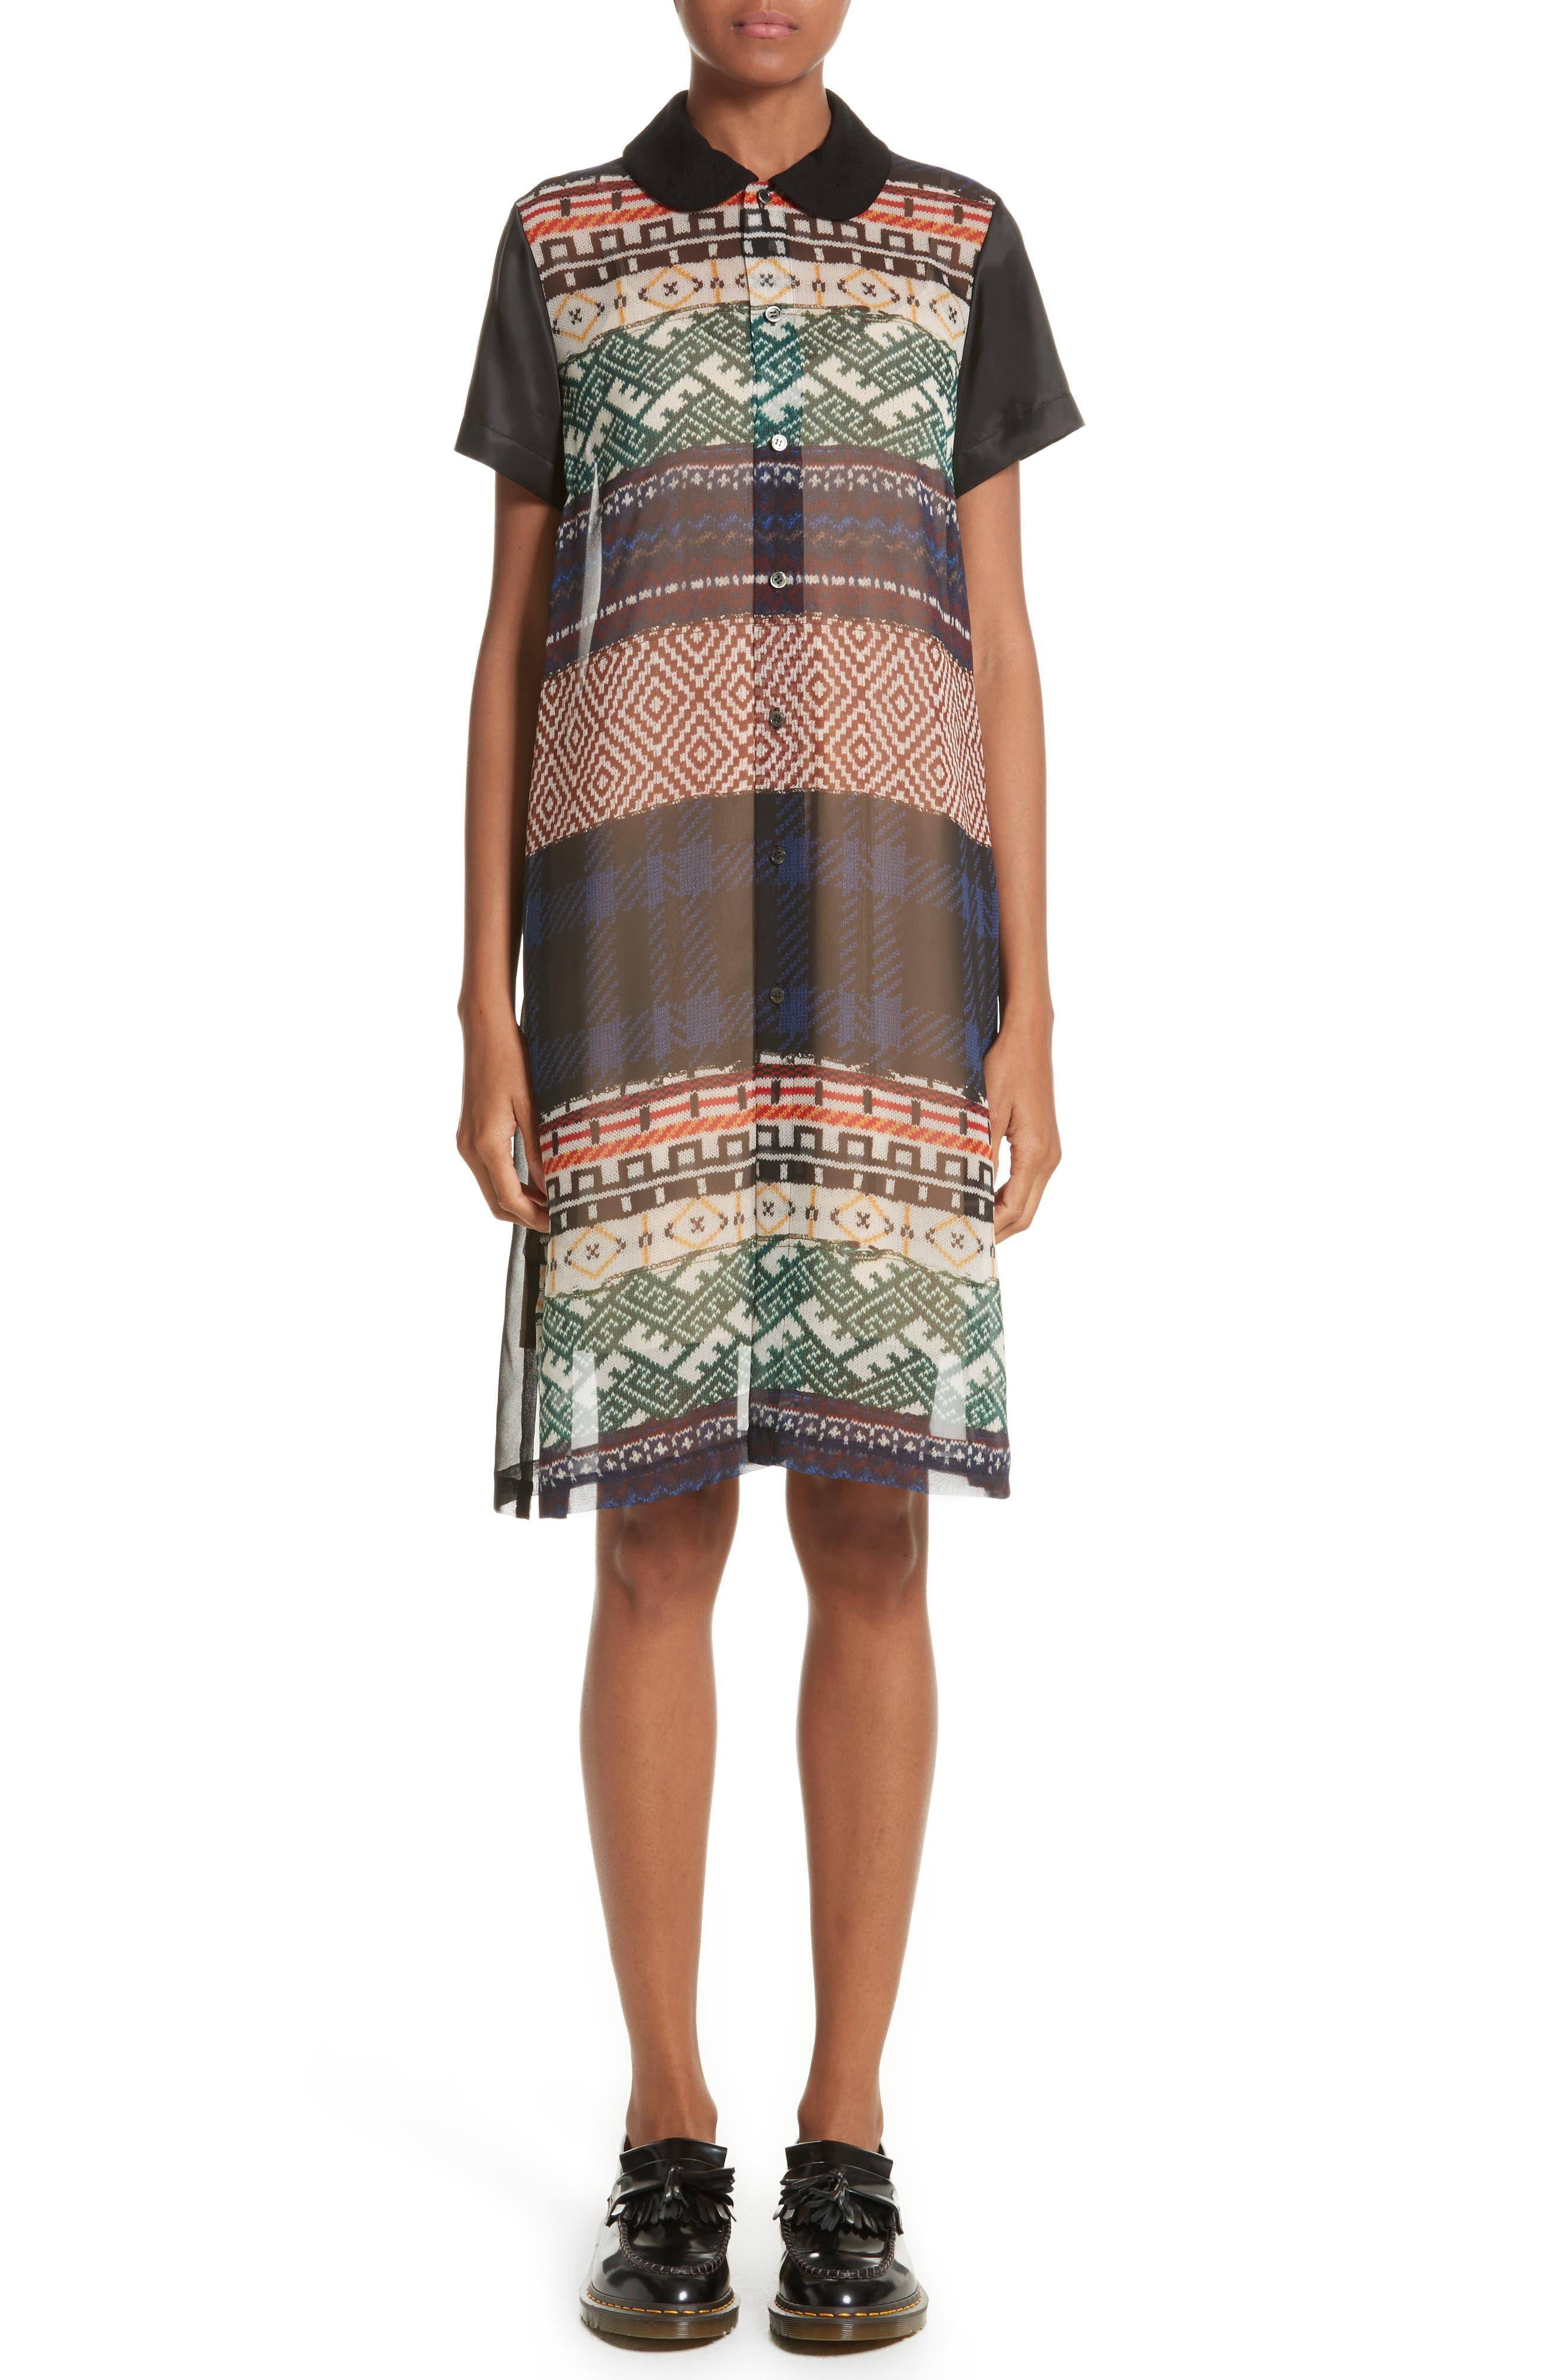 Main Image - Tricot Comme des Garçons Mixed Print Short Sleeve Dress